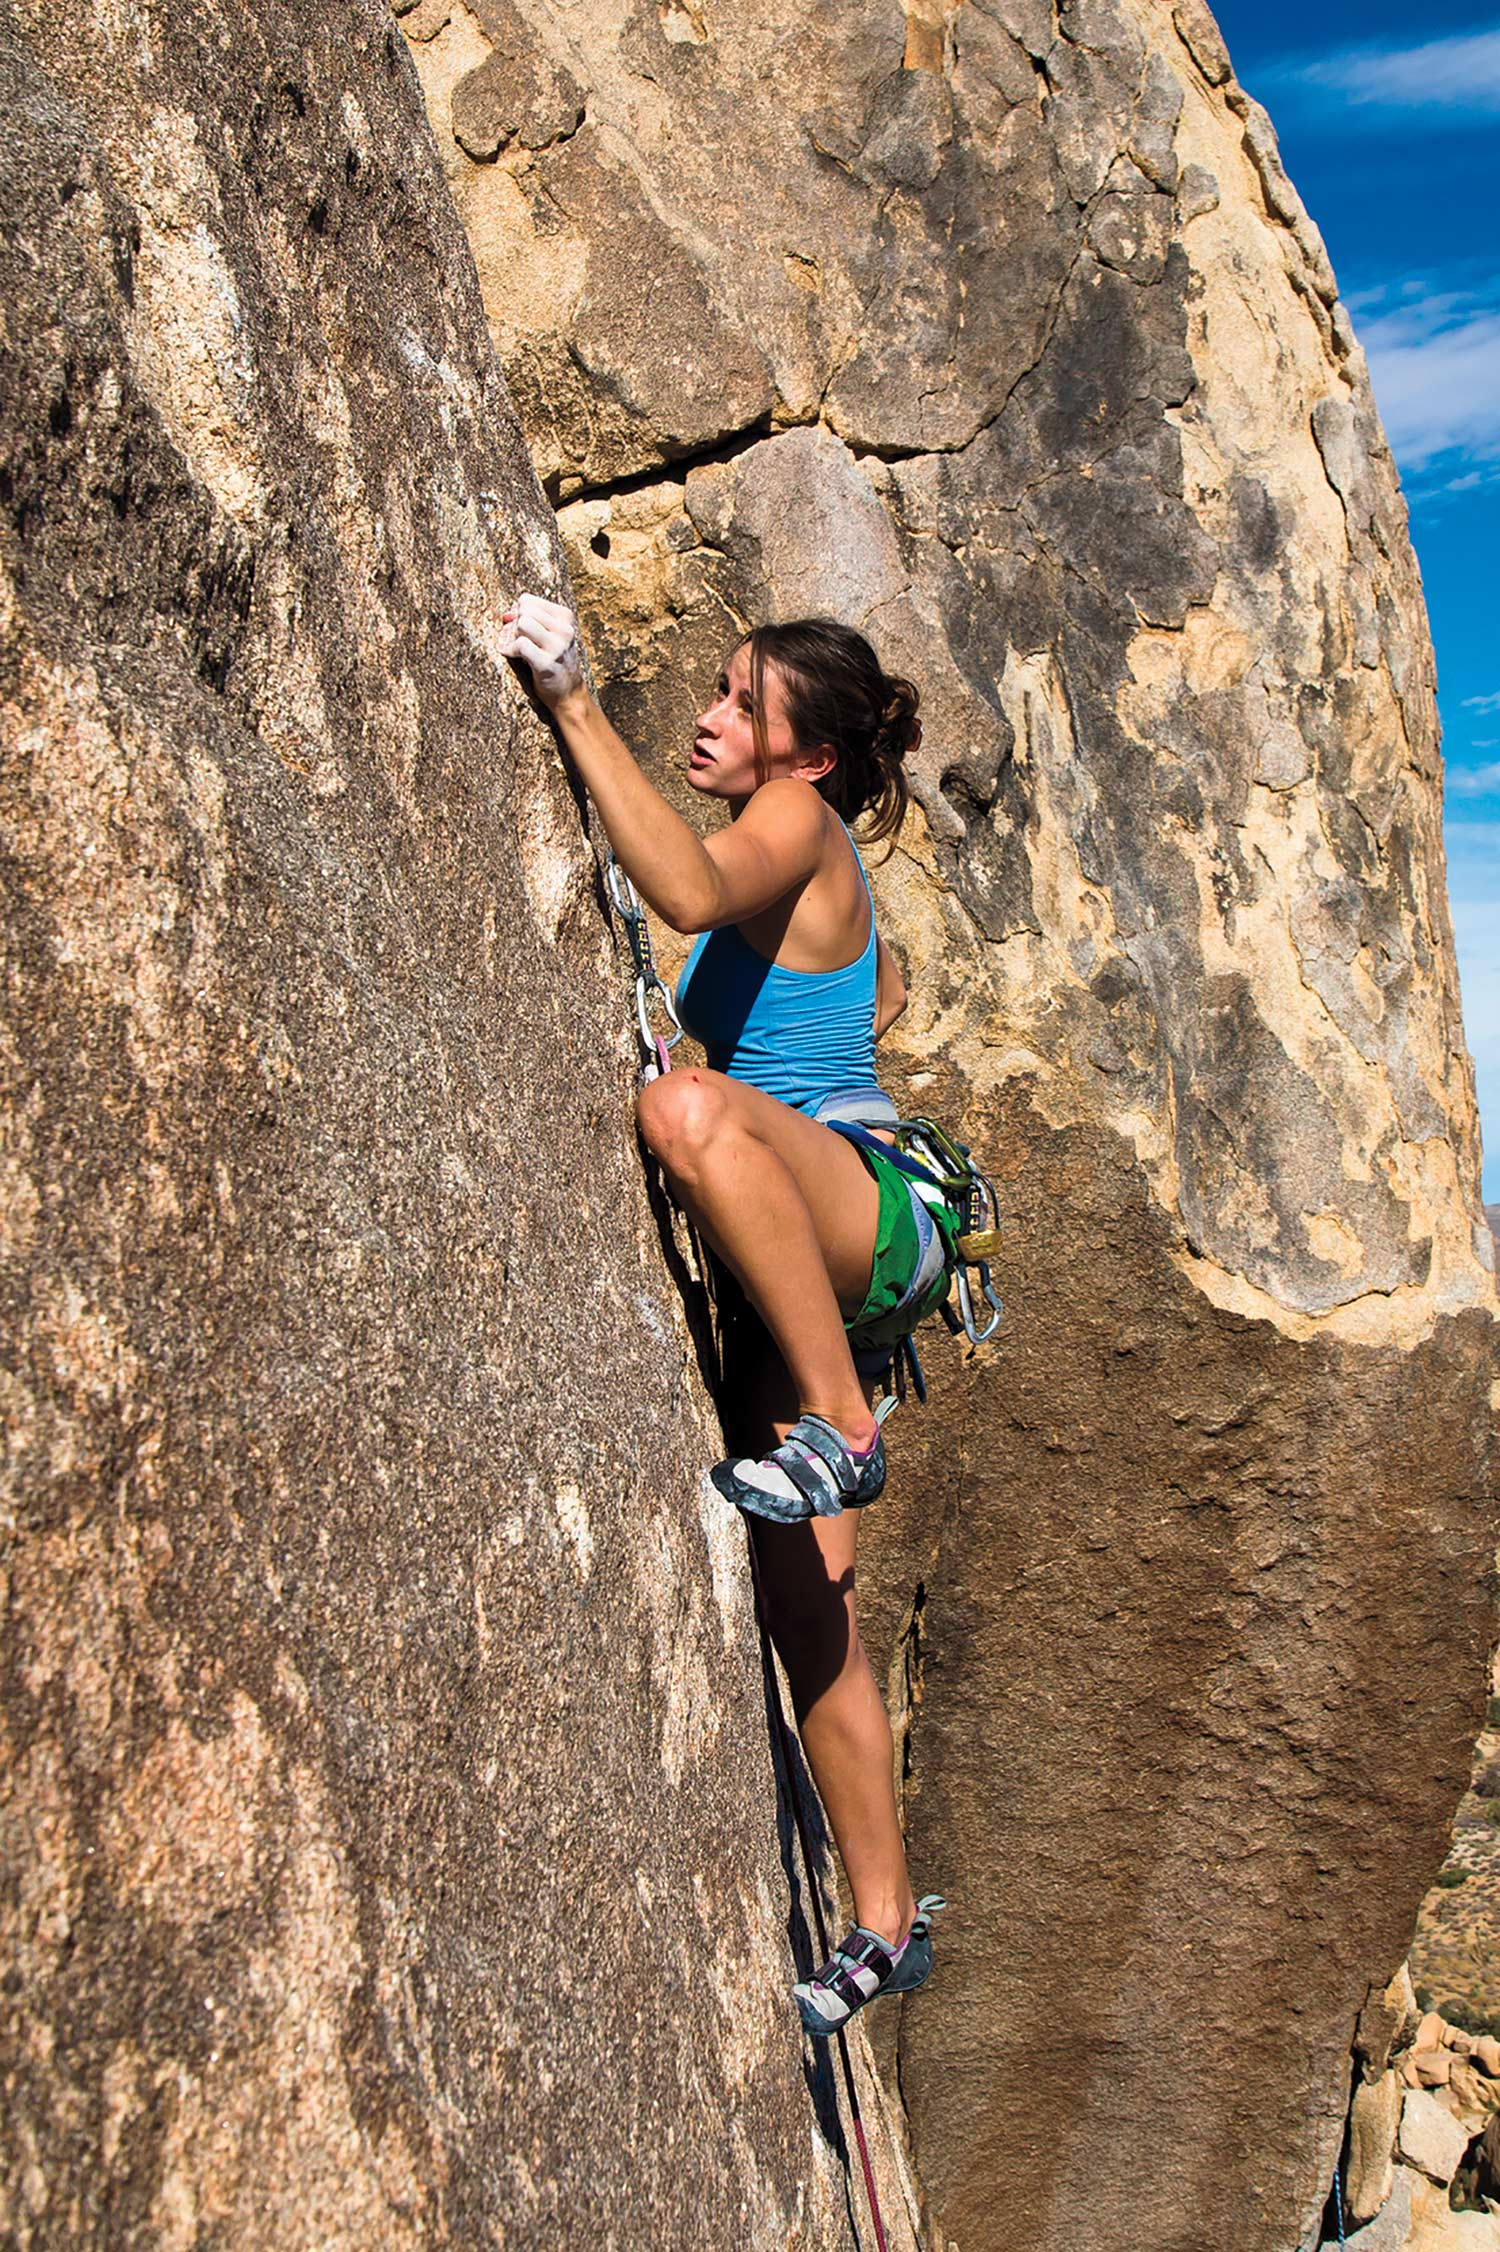 Photo courtesy Arizona Climbing & Adventure School